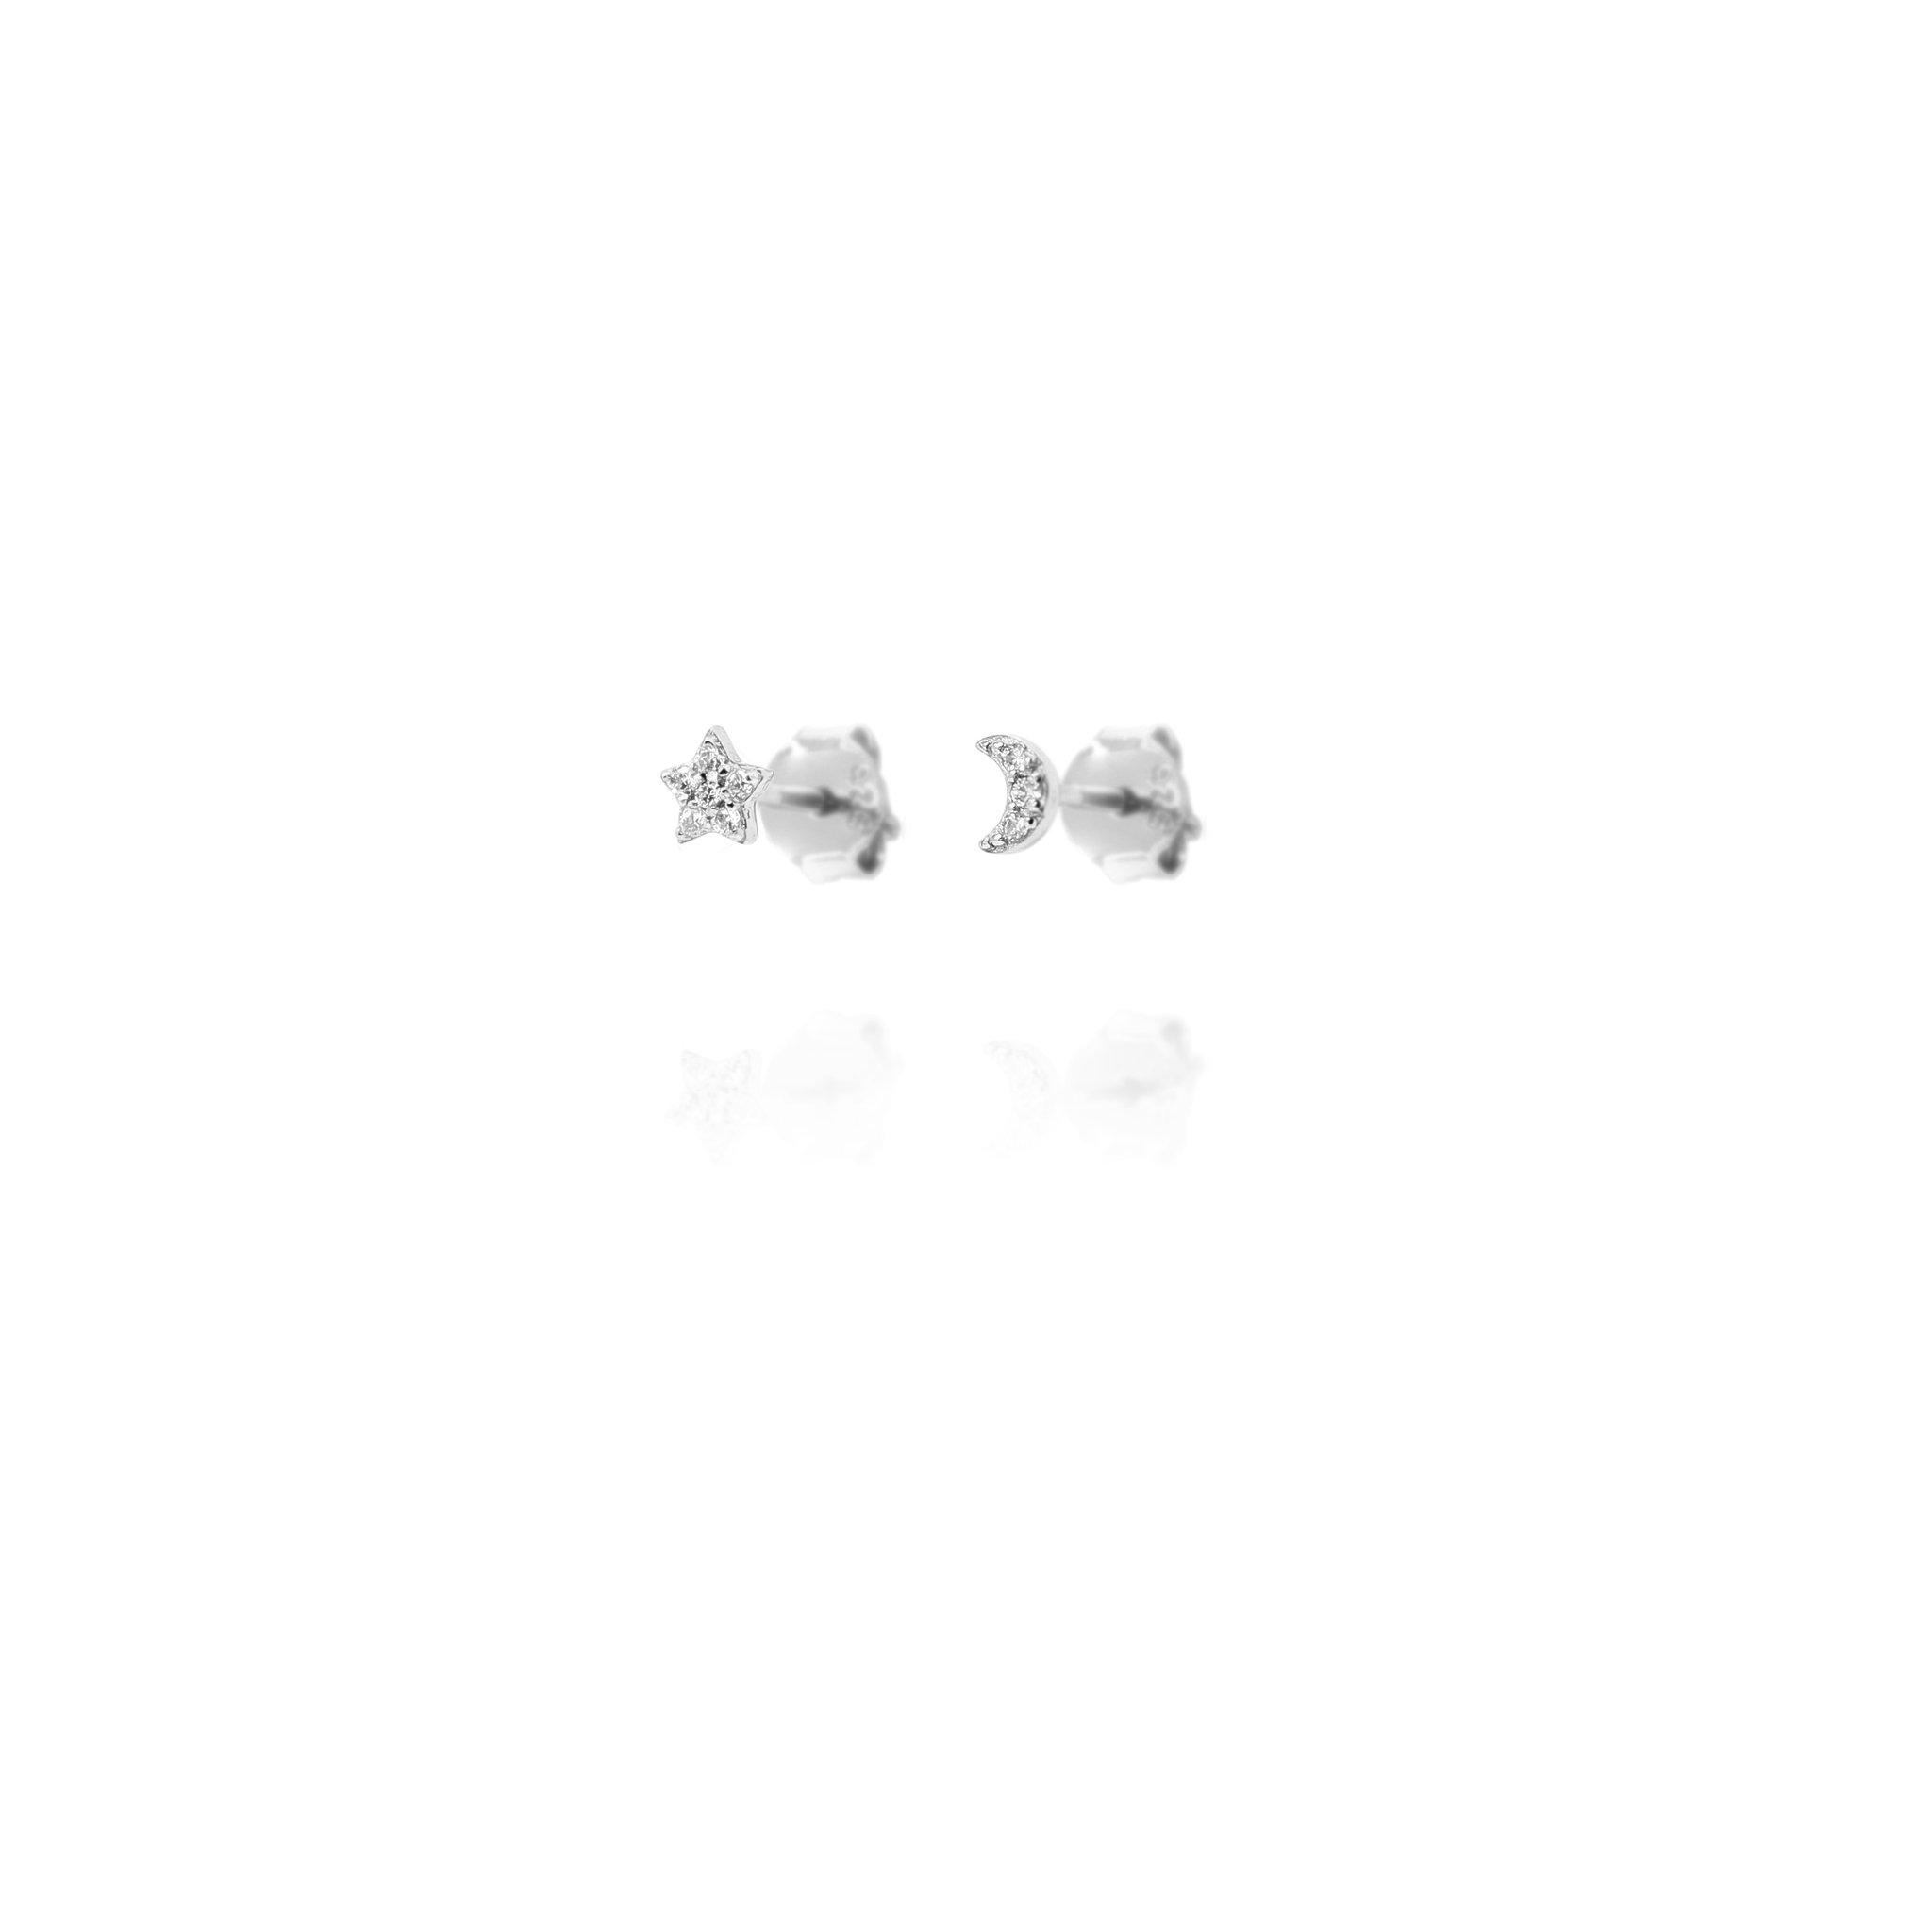 Stud Earrings Sparkly Star & Moon - Sterling Silver EG-7/S